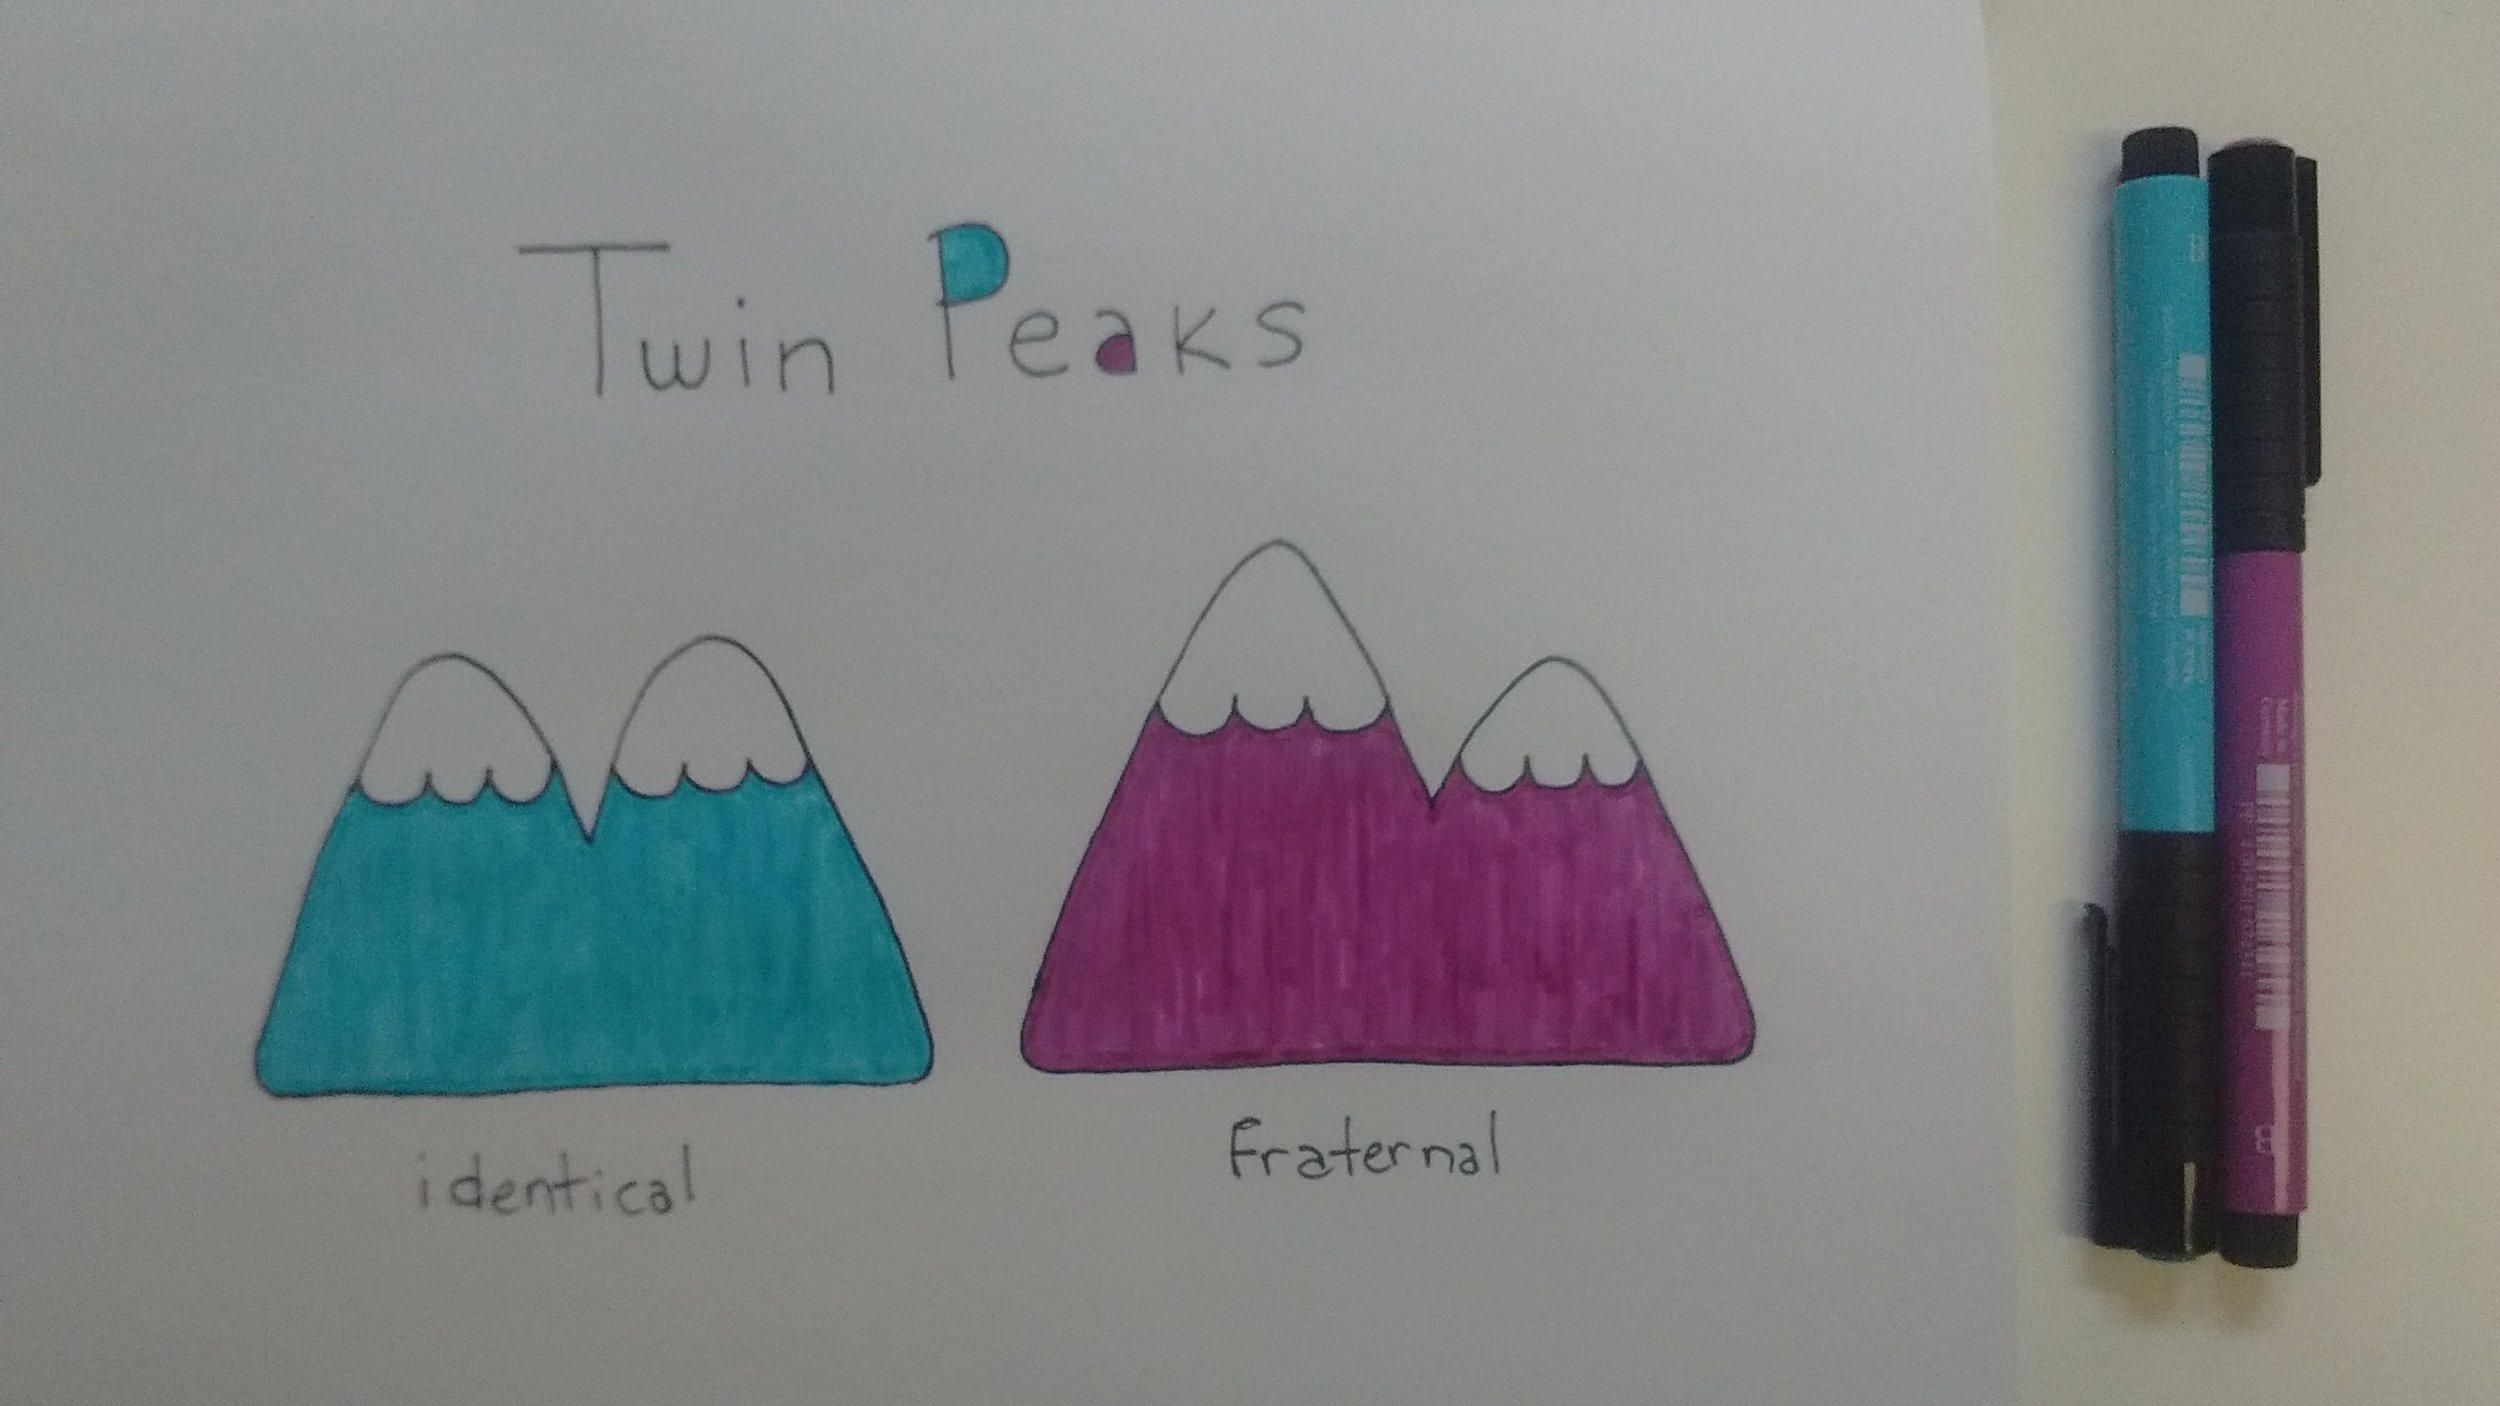 Twin peaks colour